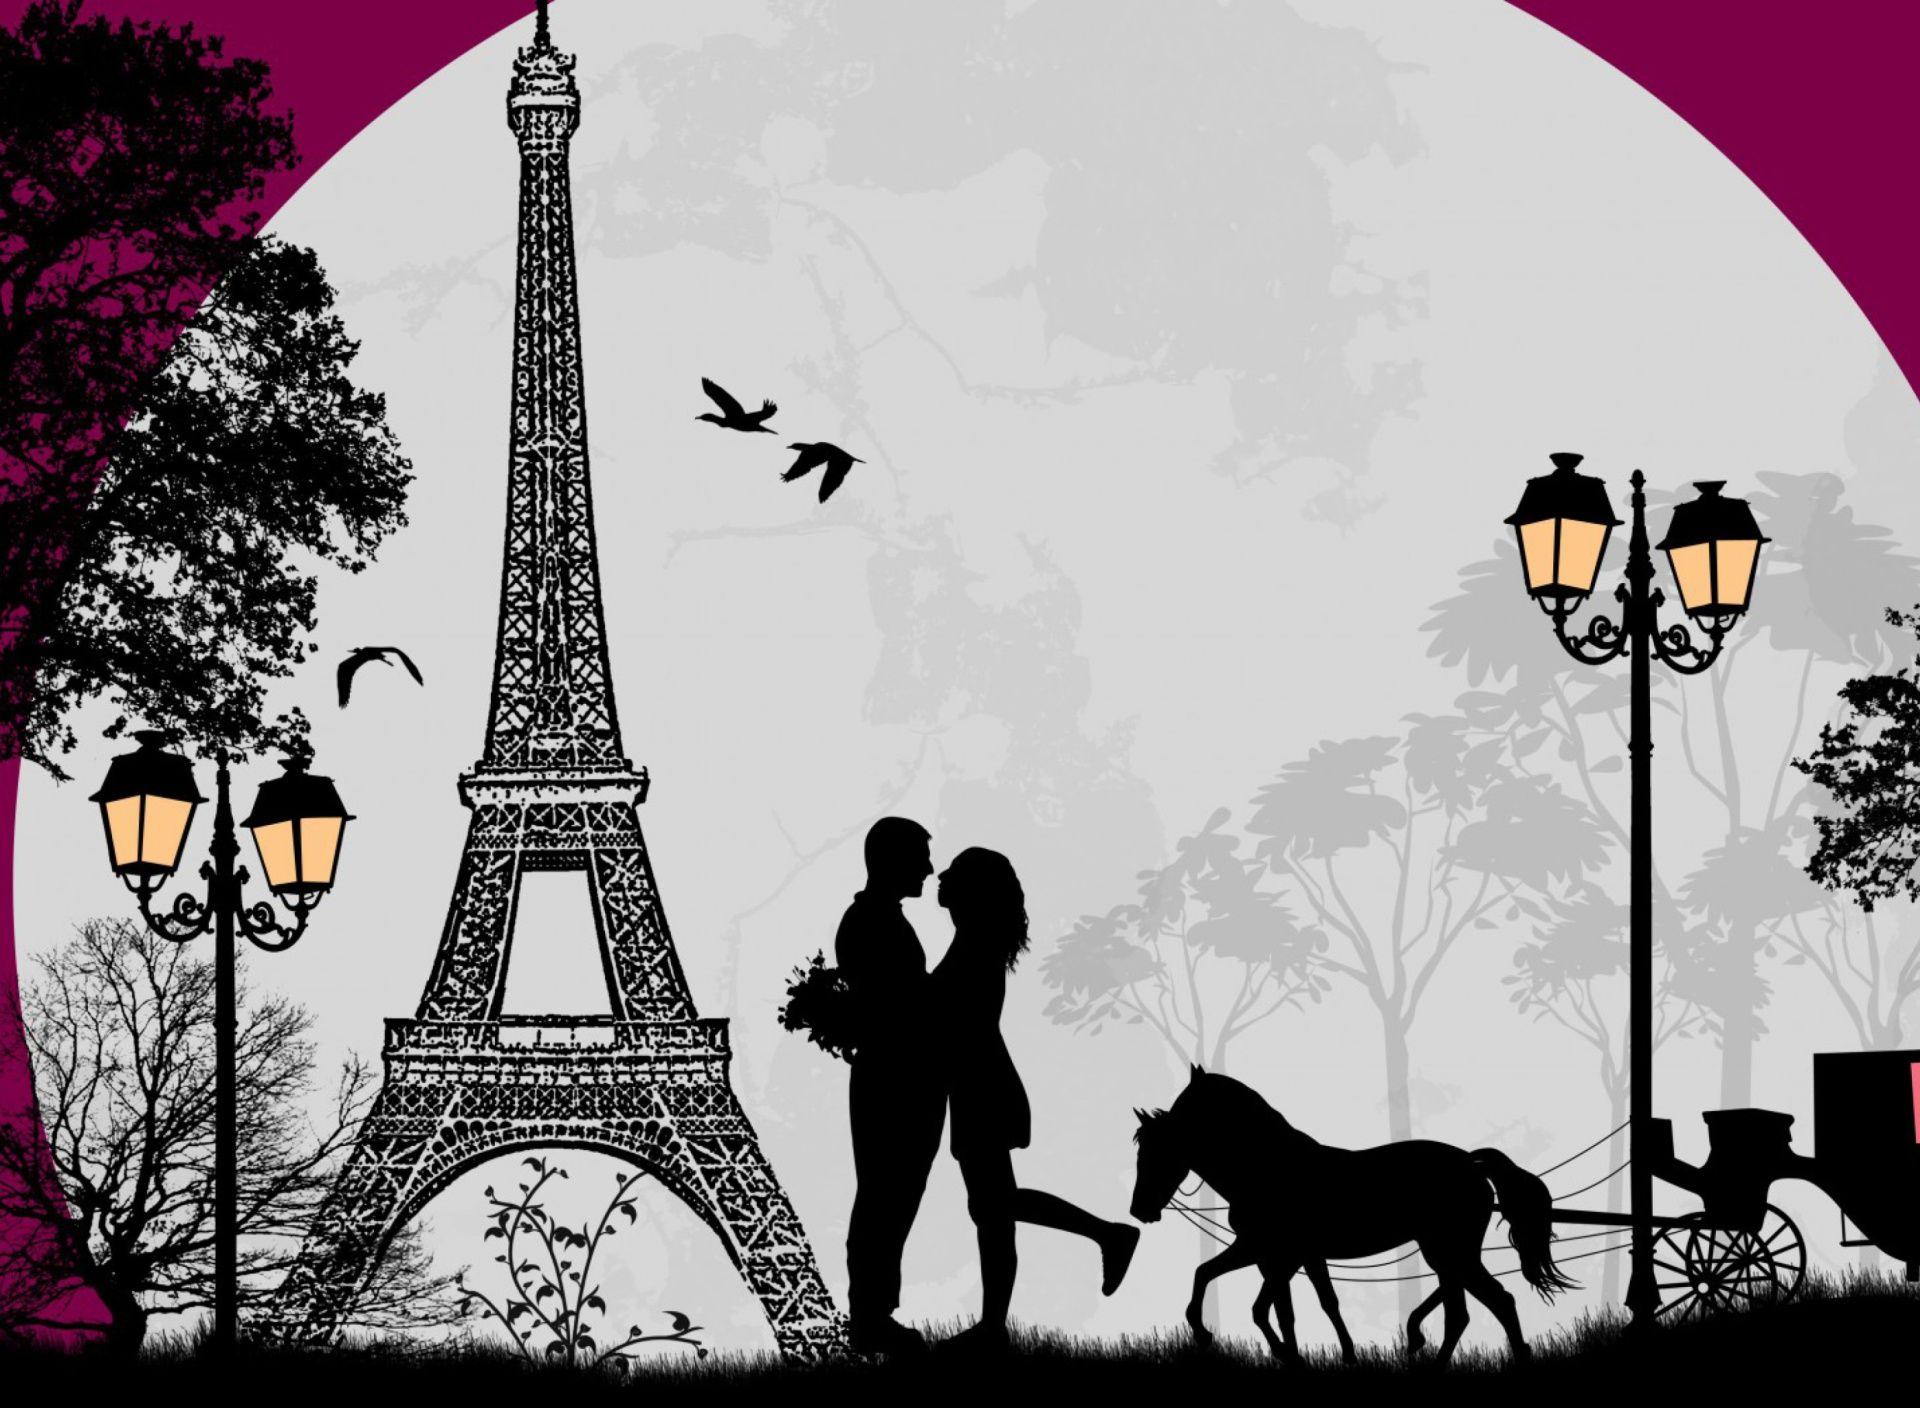 Wallpaper Paris Valentines Day In Paris Wallpaper Wide Or